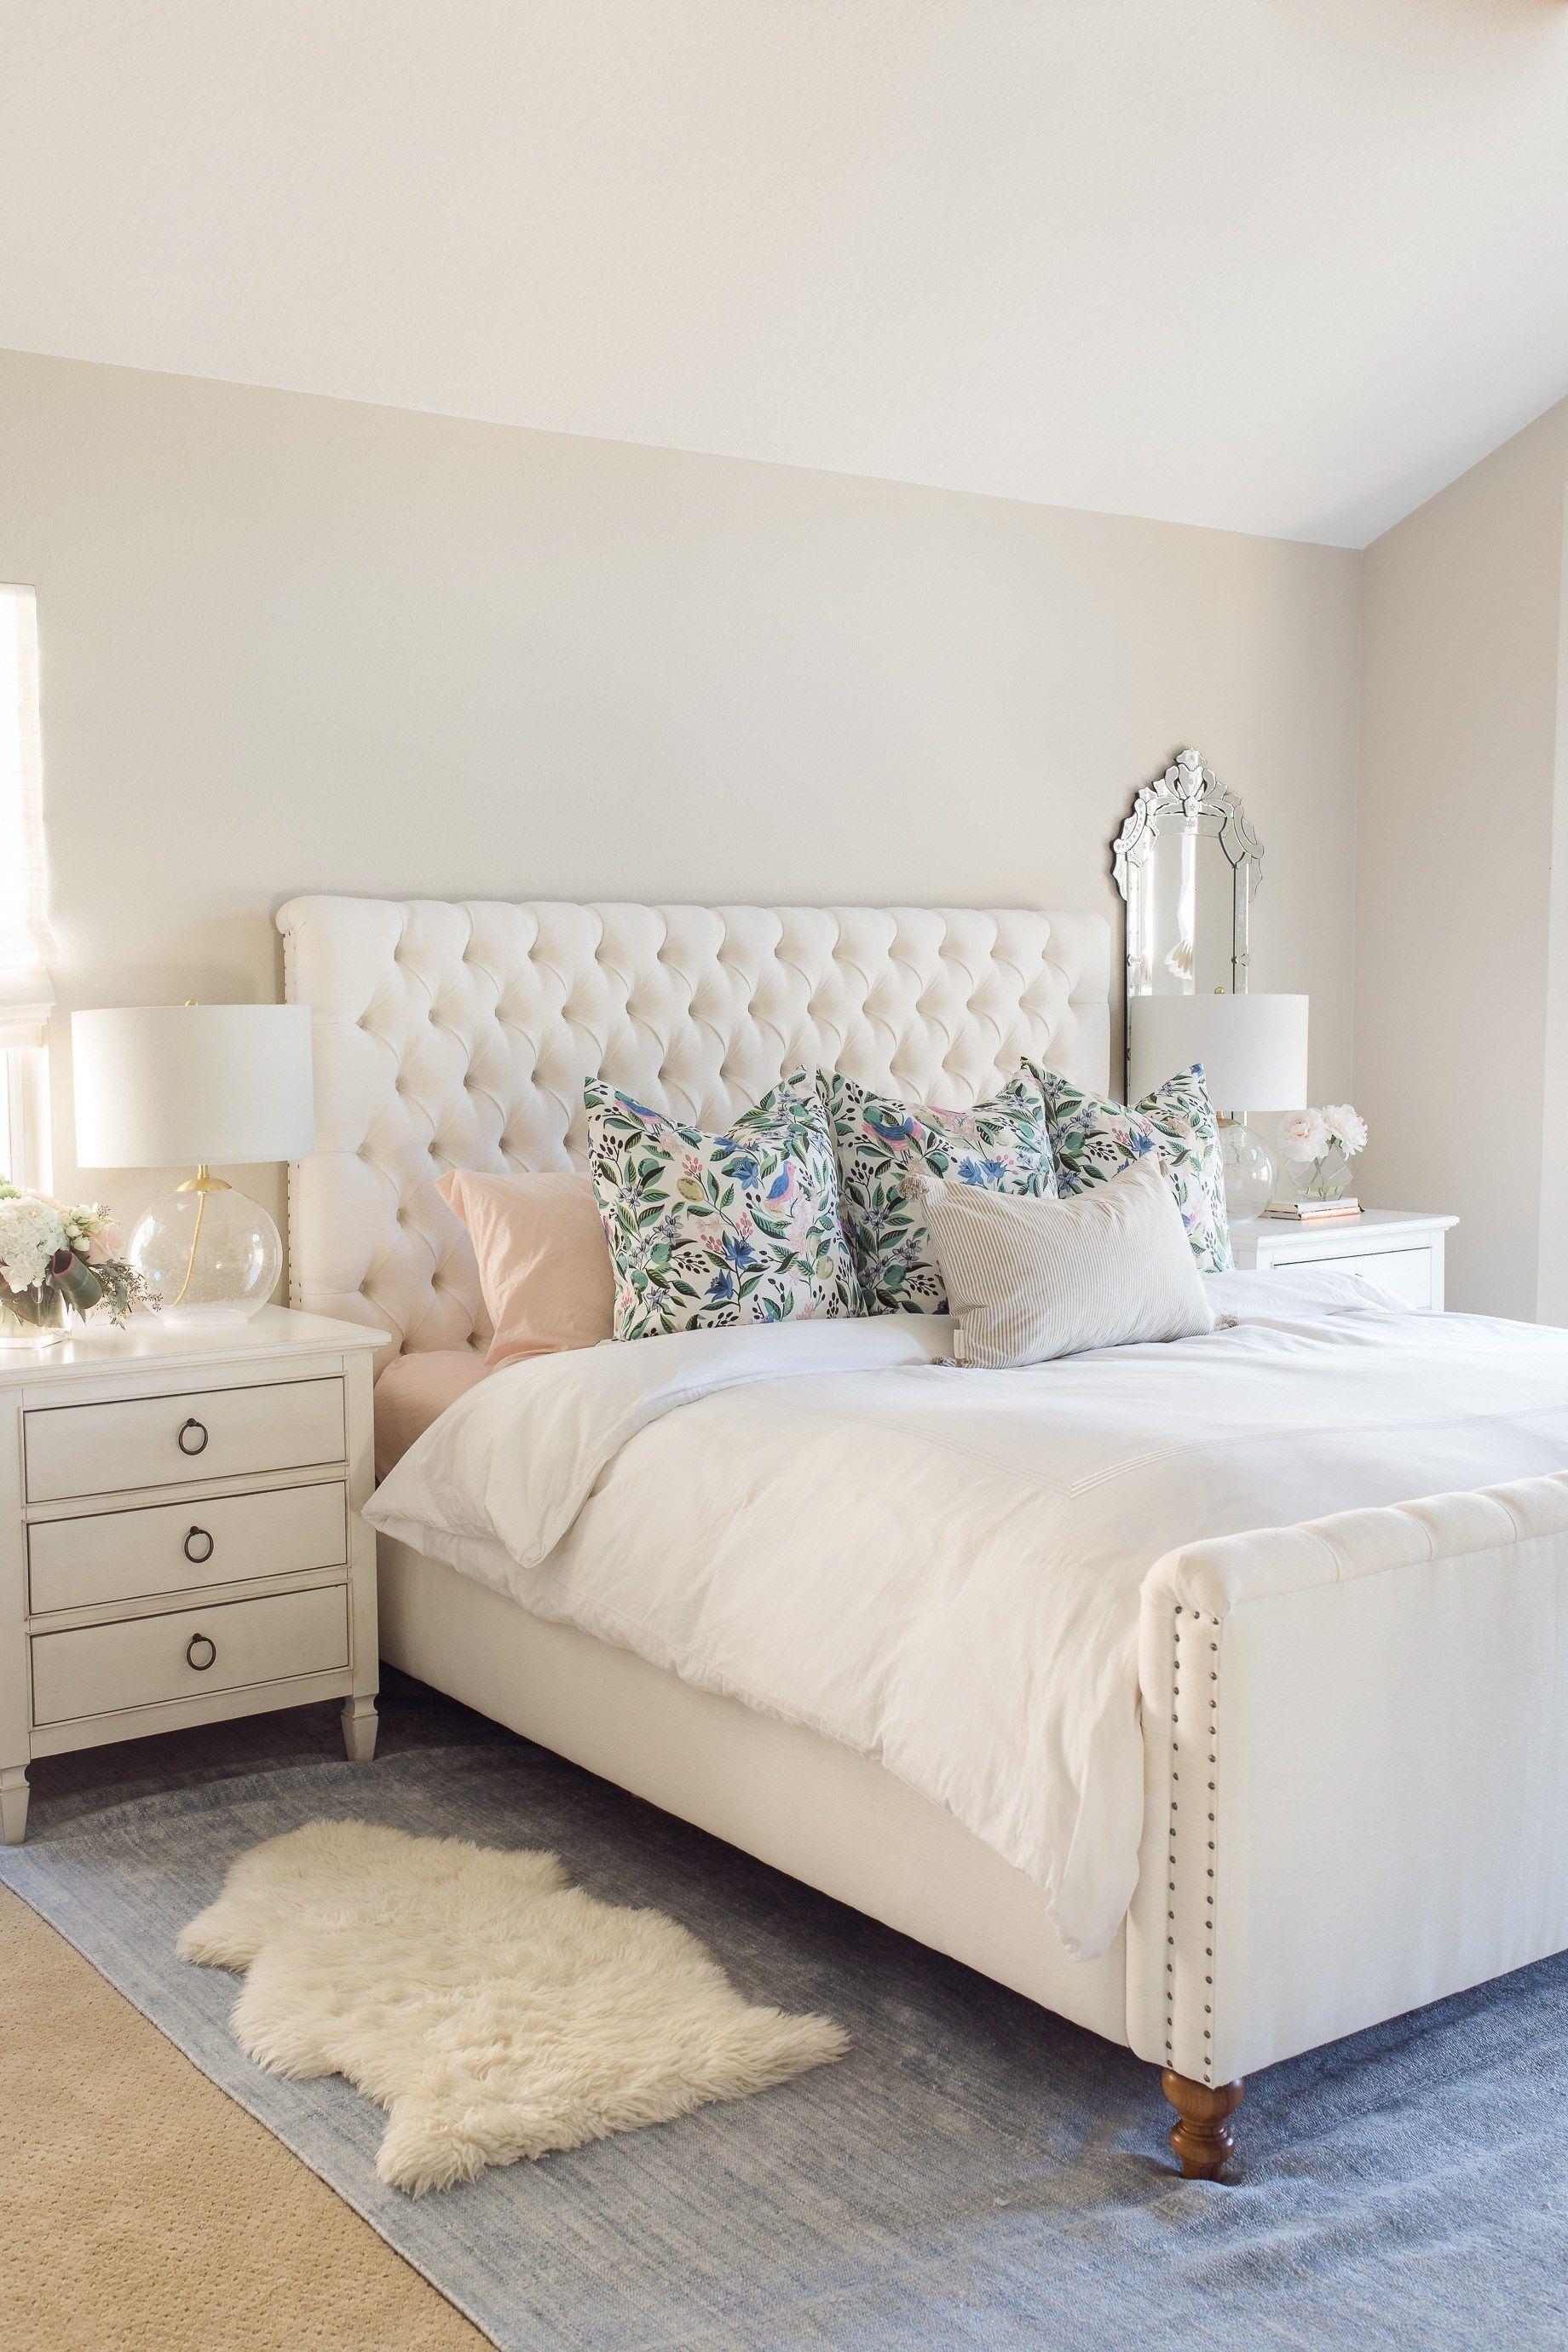 My Bedroom Decor Reveal M Loves M Dormitorios De Matrimonio Modernos Decorar Dormitorio Matrimonio Decoracion Dormitorio Matrimonio